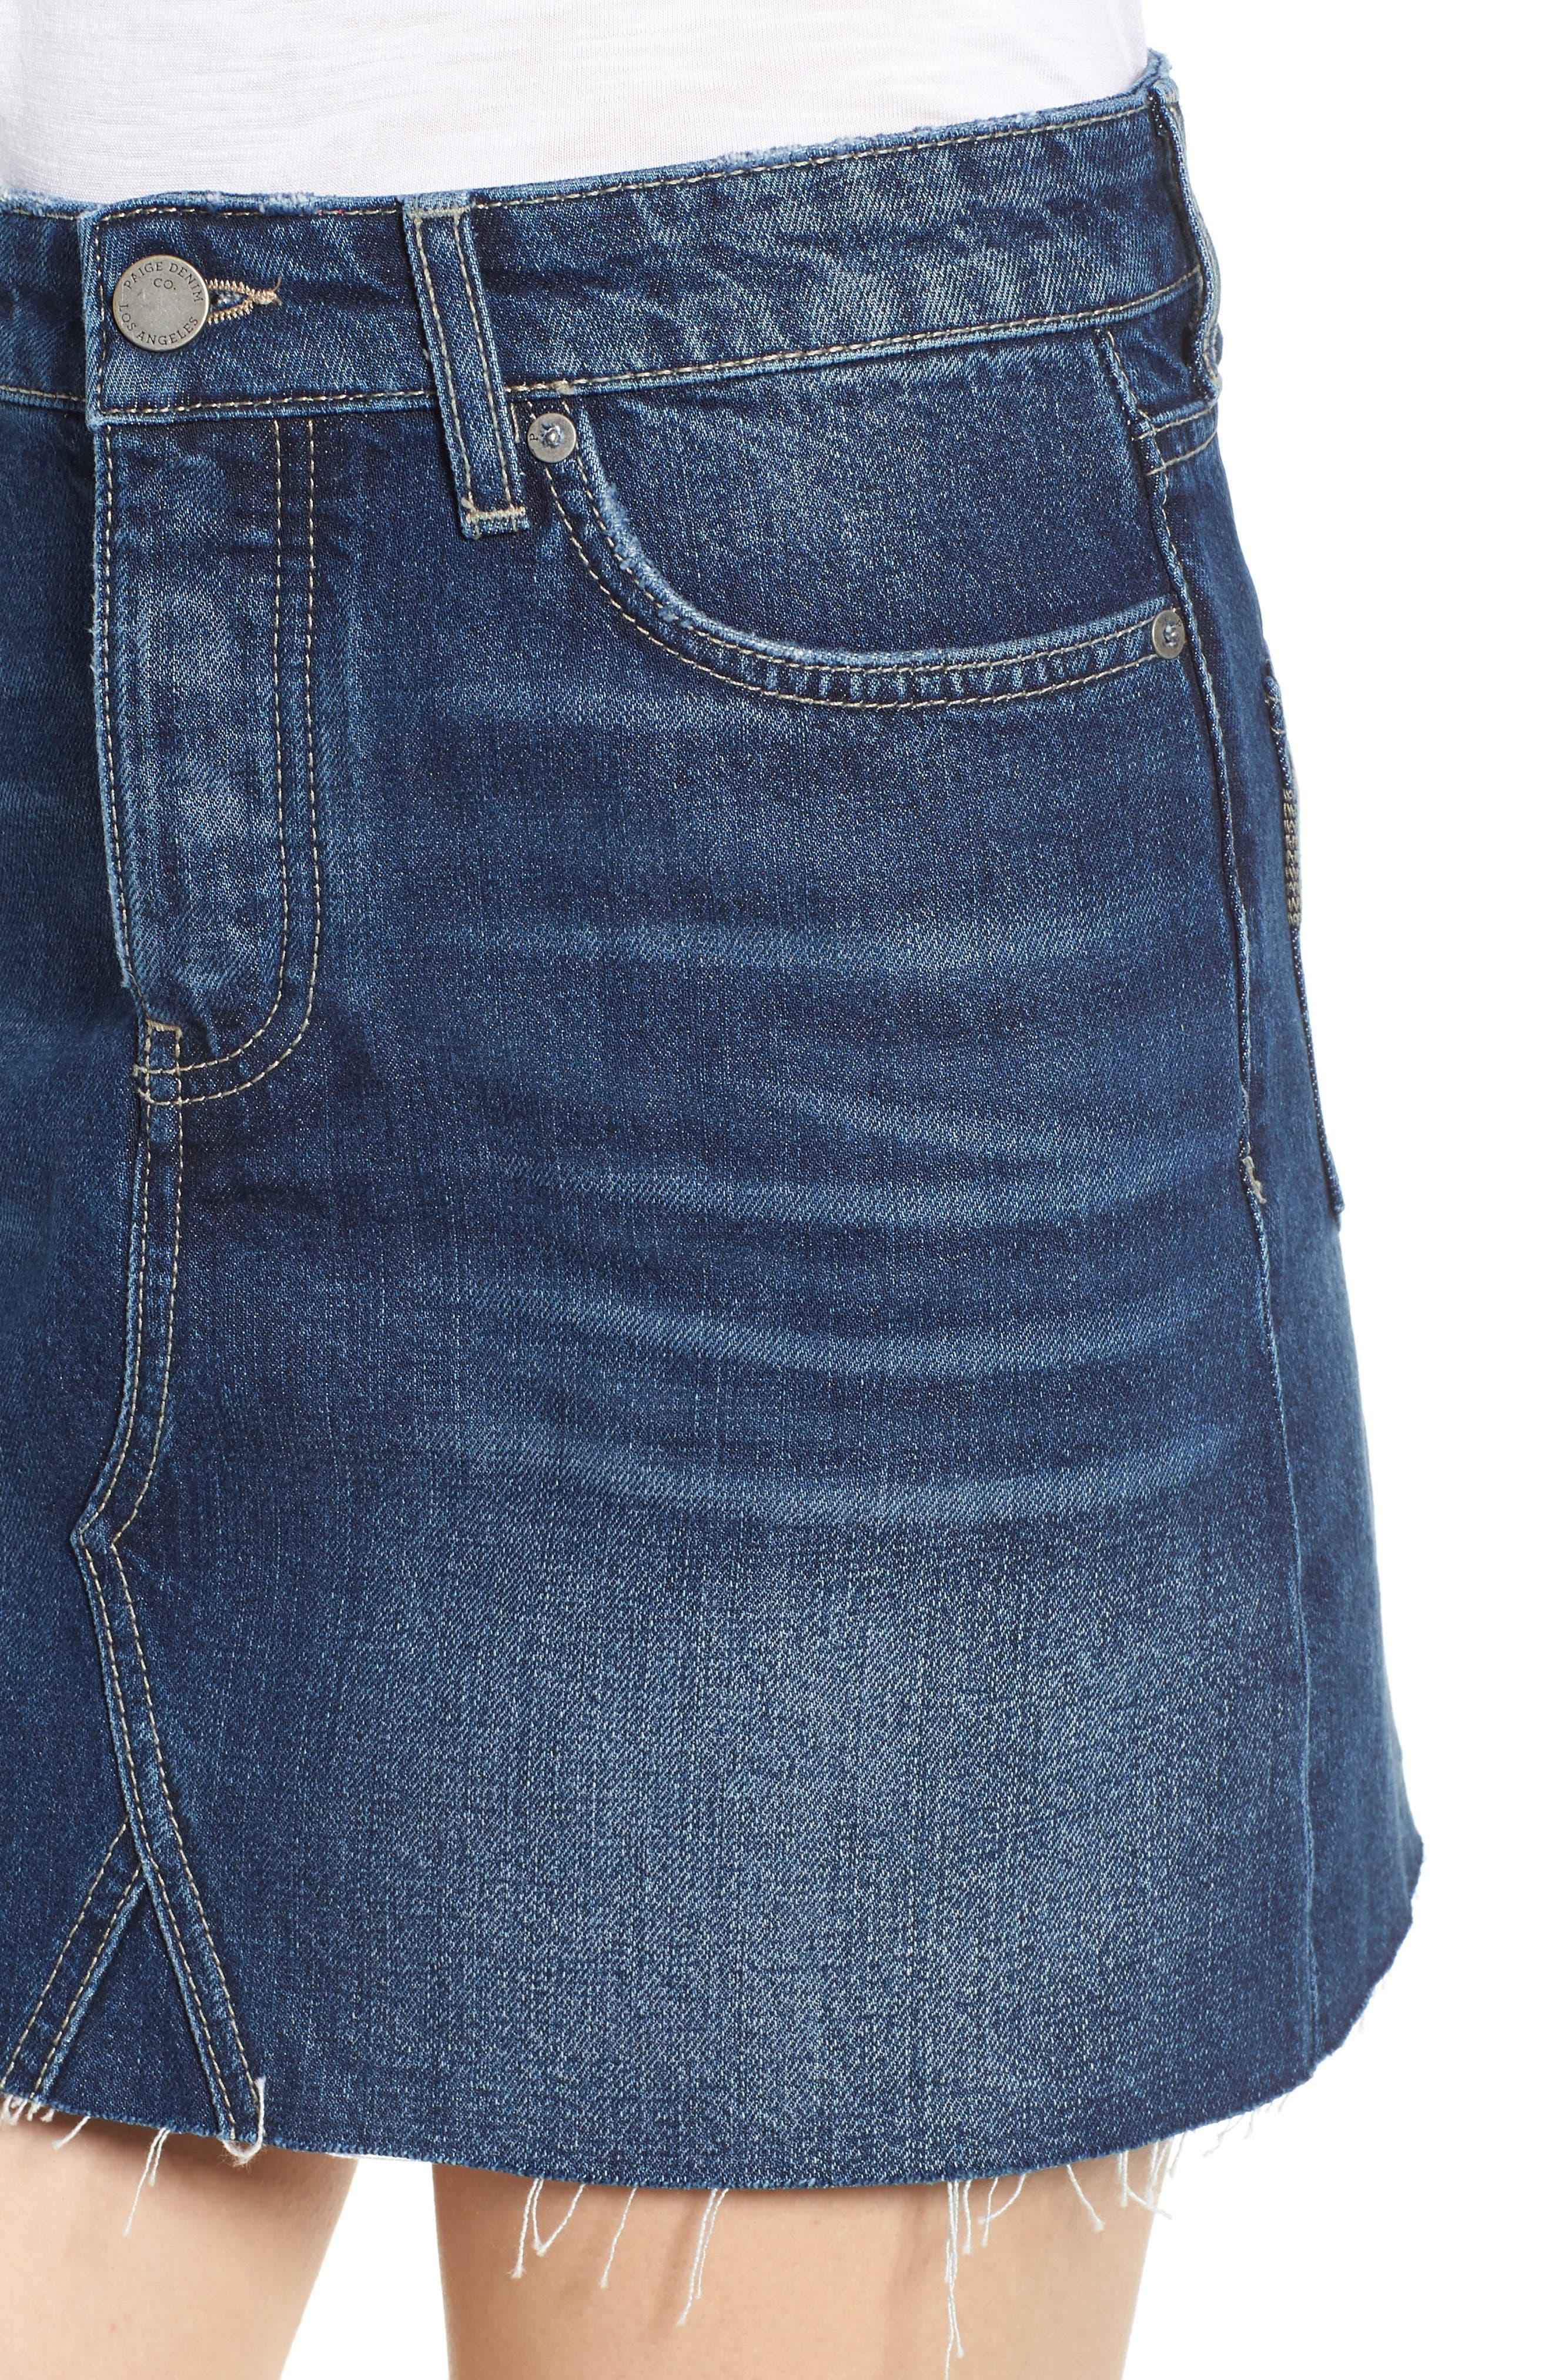 Aideen Denim Miniskirt,                             Alternate thumbnail 4, color,                             400